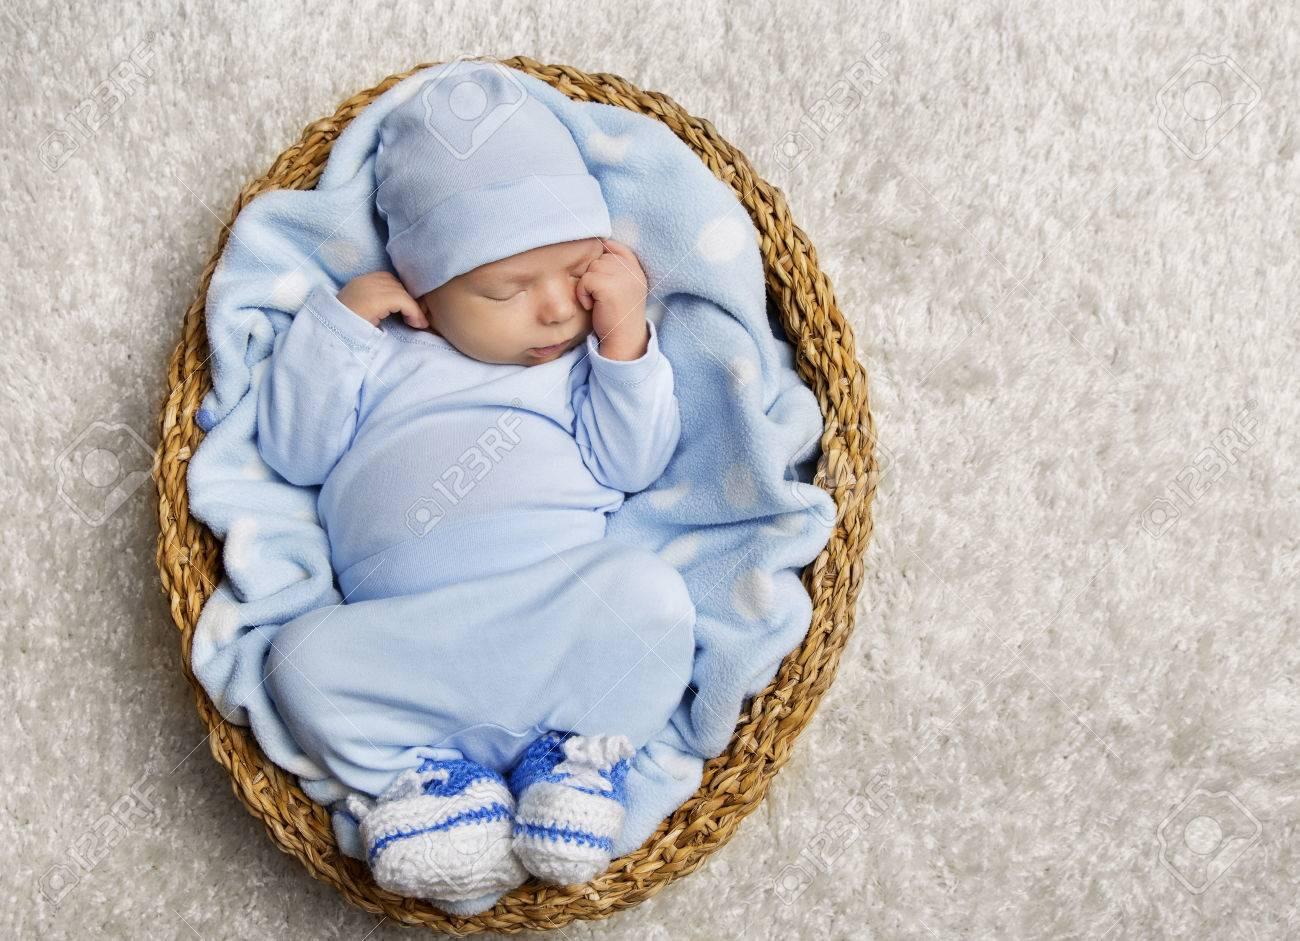 629d1ddfd Bebé Durmiendo